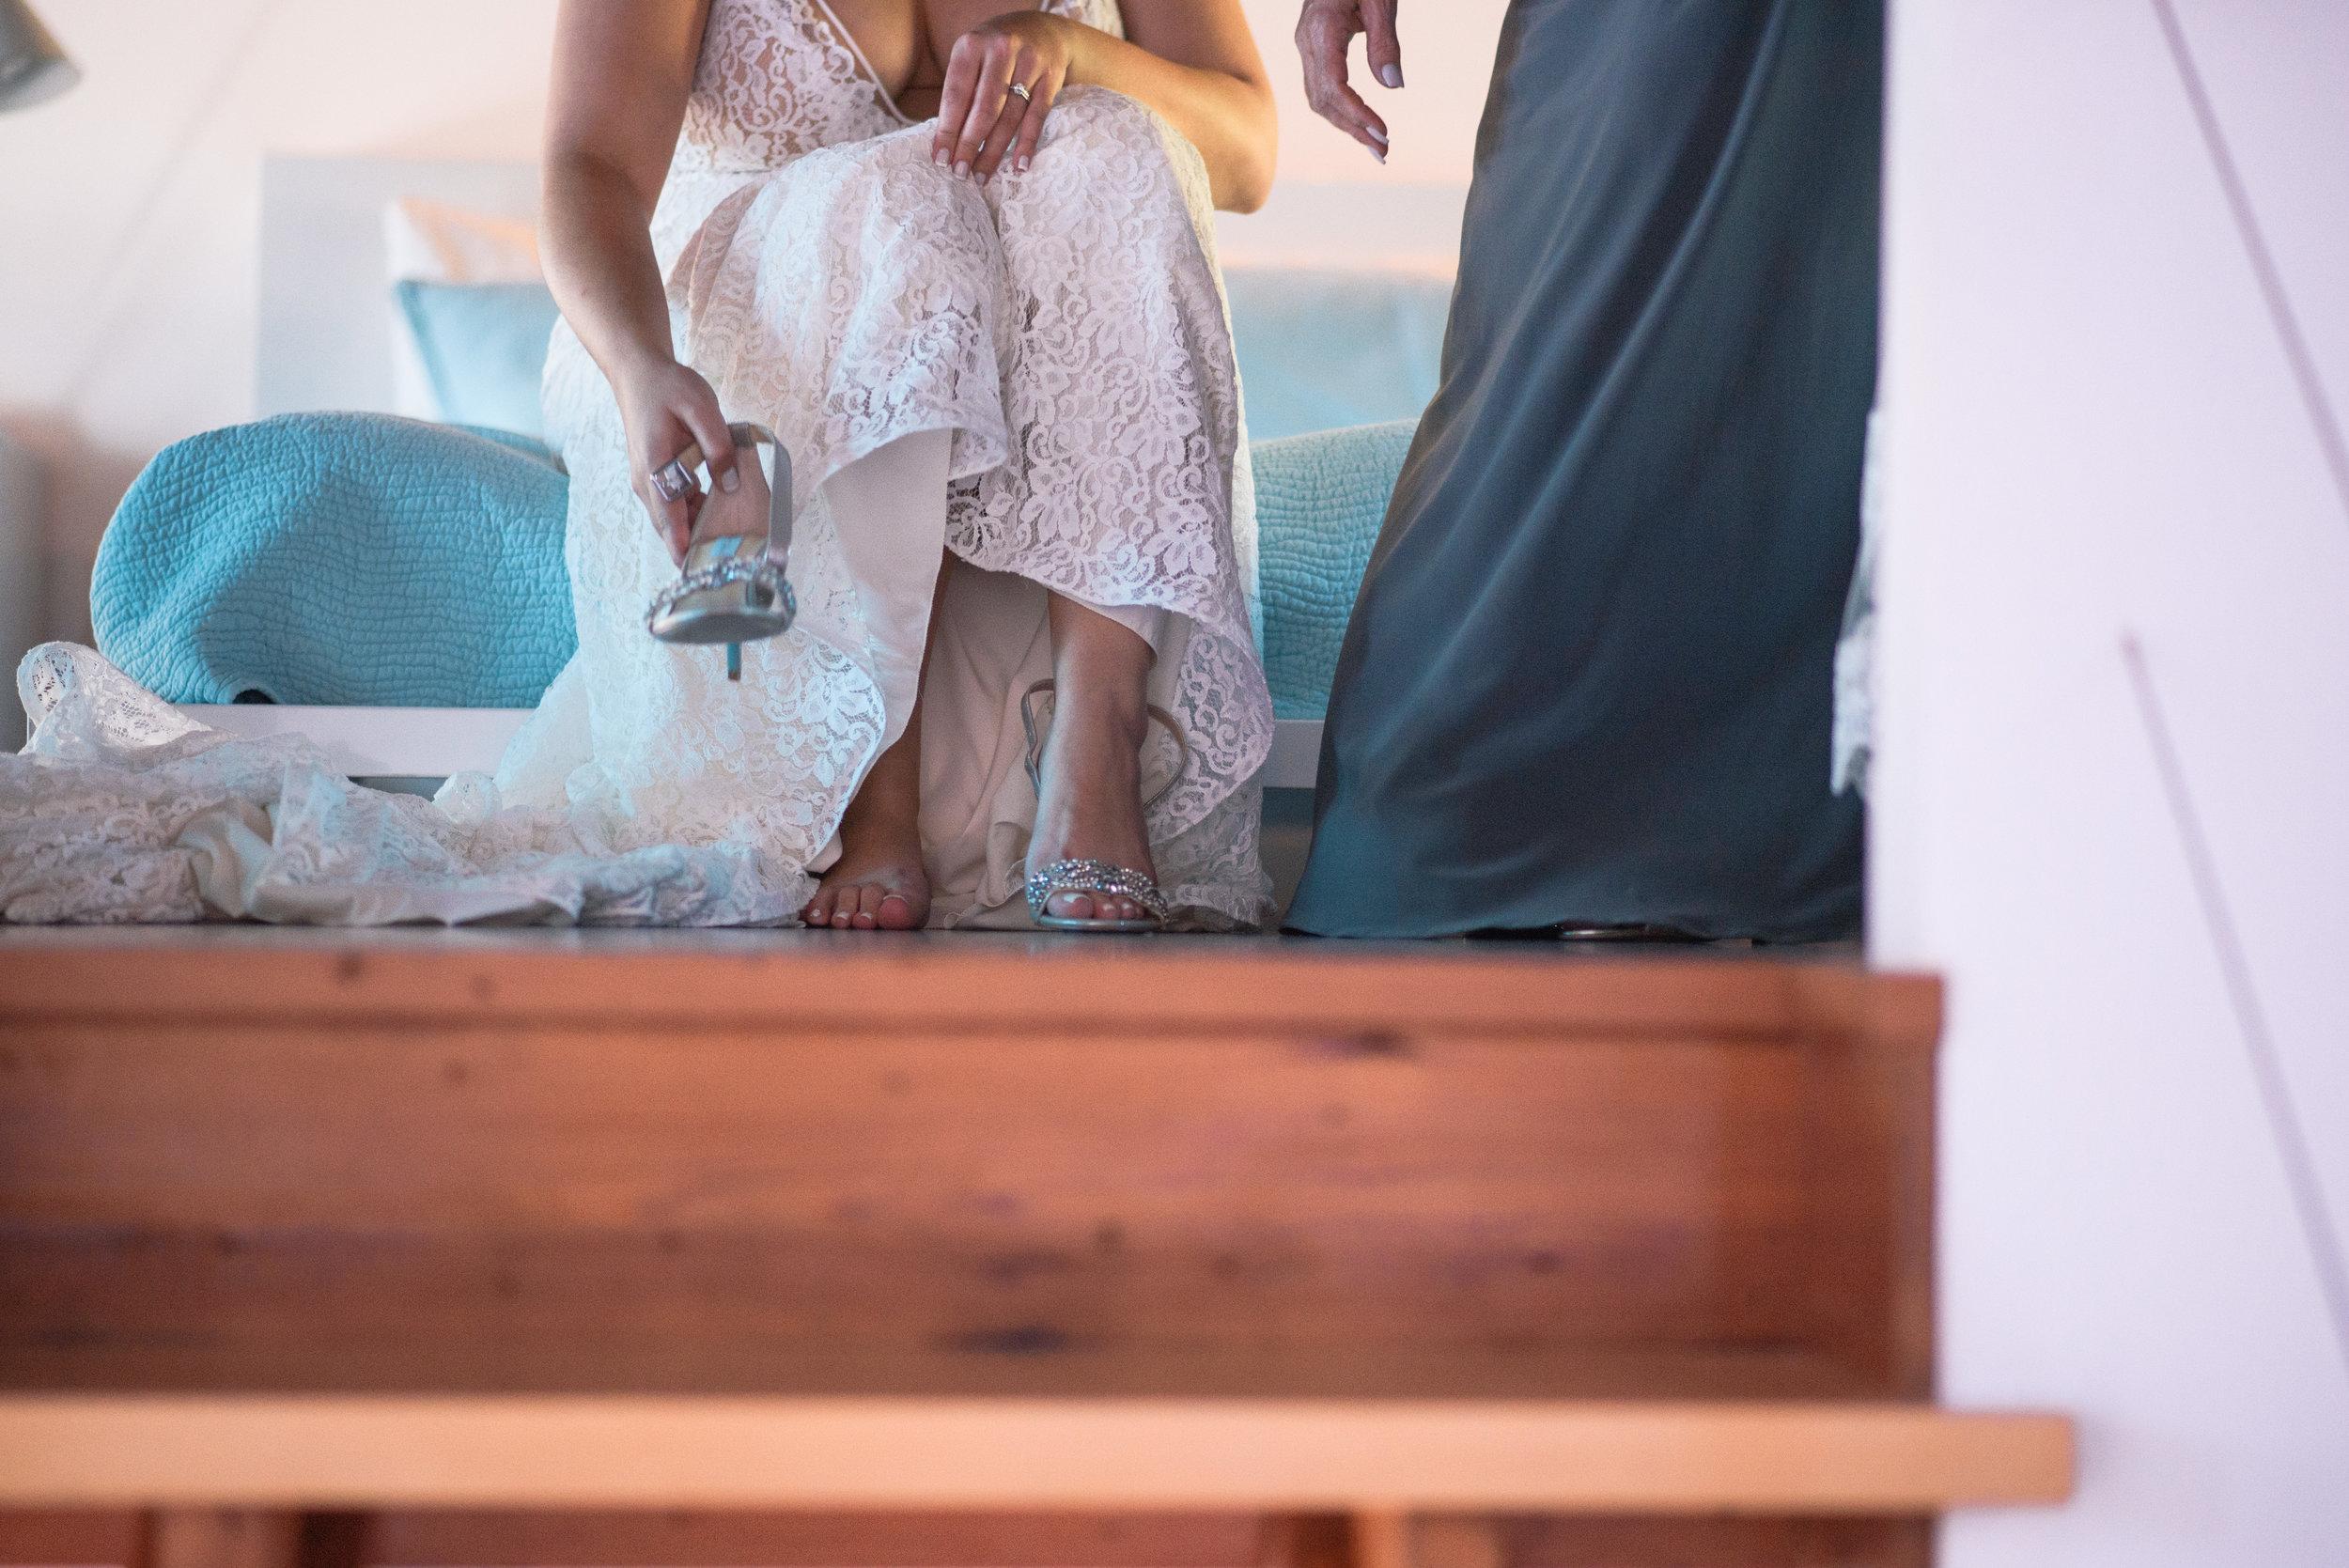 Iggy-and-yesenia-savannah-railroad-museum-wedding-meg-hill-photo- (225 of 1037).jpg